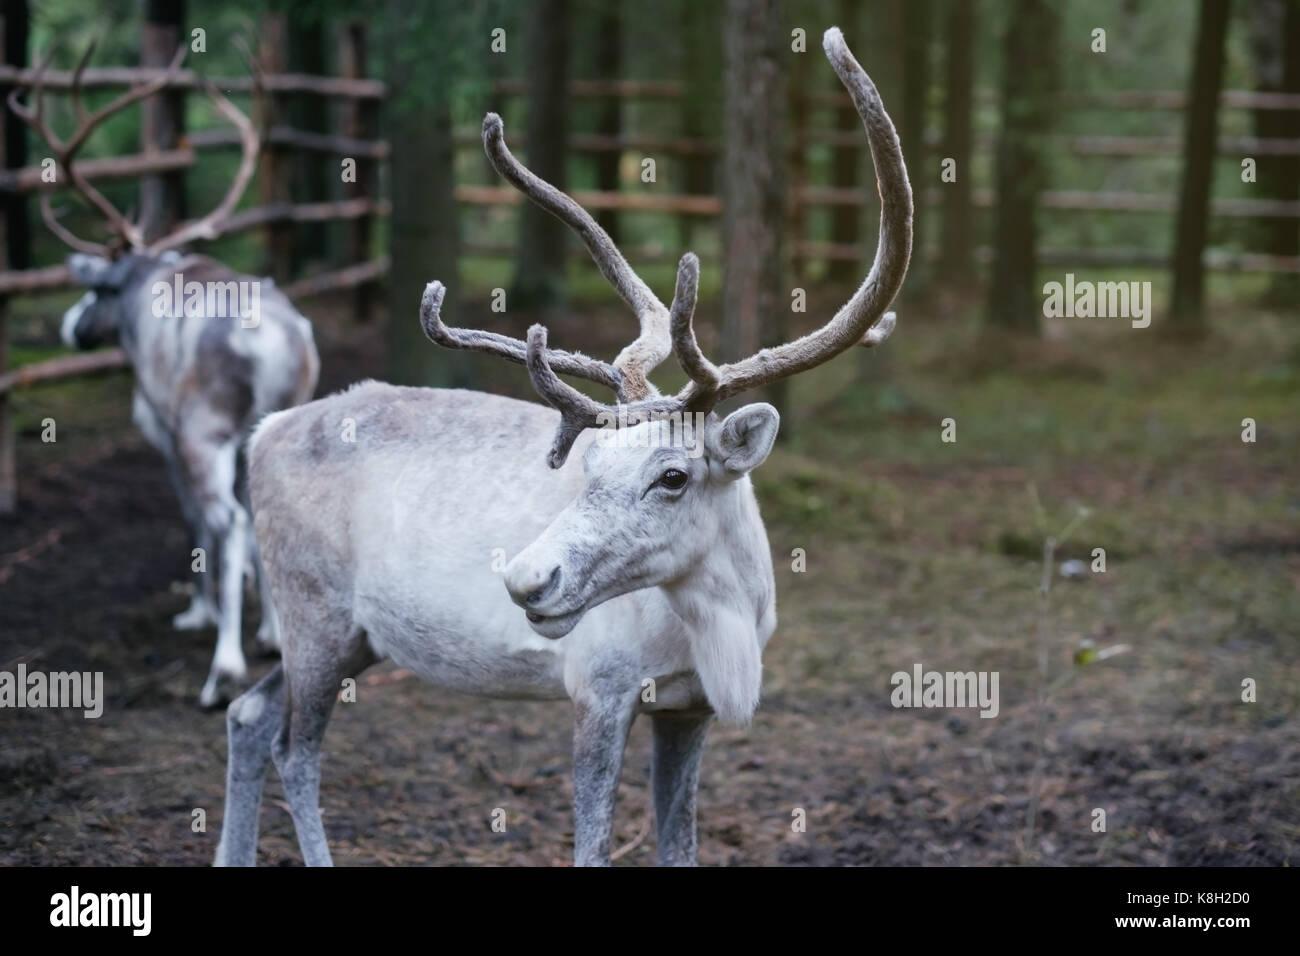 White female reindeer tarandus with huge horns in eco farm. - Stock Image